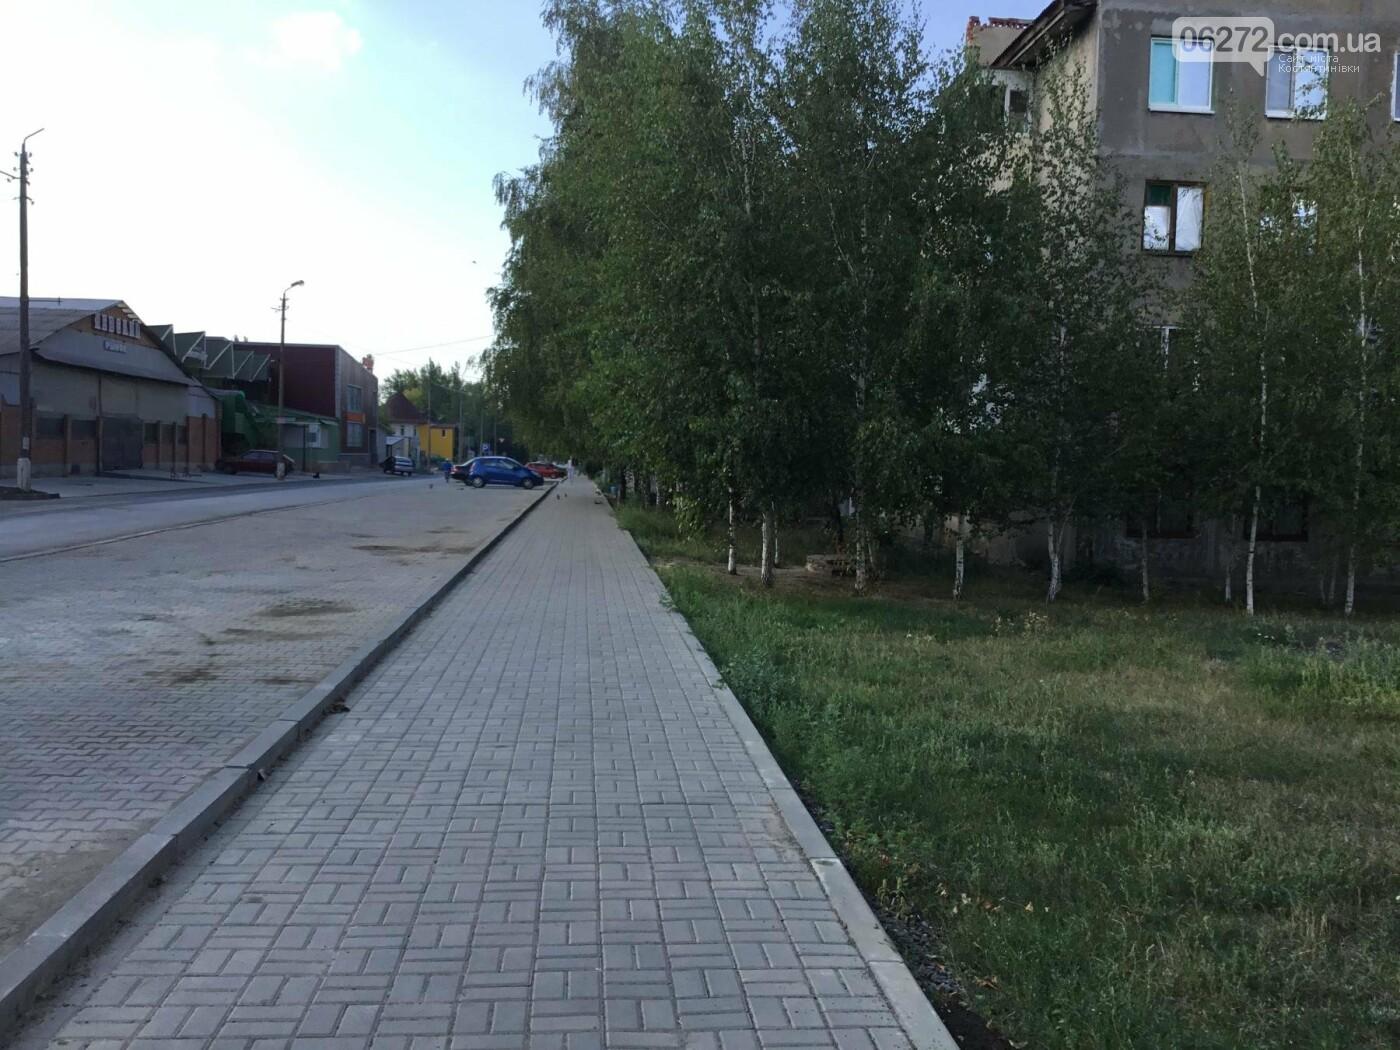 Дорога после ремонта по ул. Леваневского в Константиновке, фото-5